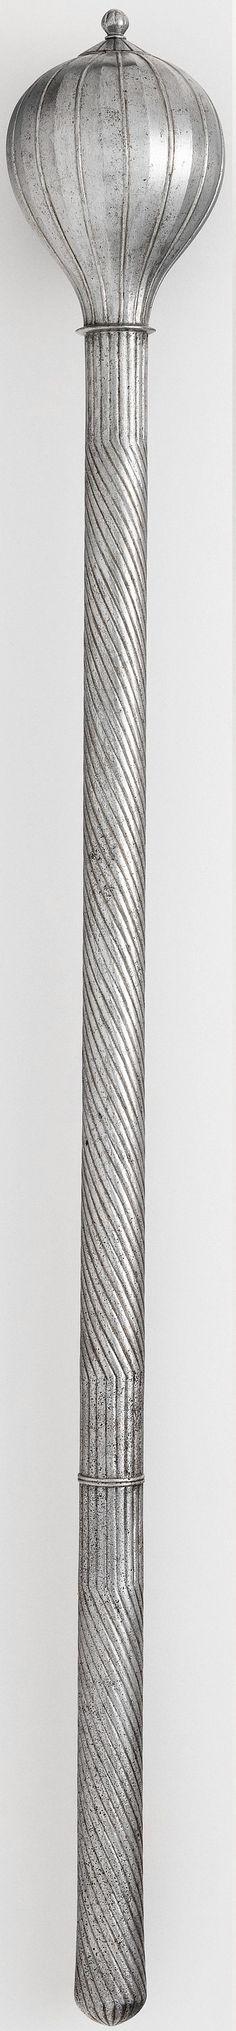 Ottoman mace, 16th century, steel, weight, 2 lb. 12 oz. (1247 g) Length, 28 in. (71.12 cm) Length of head, 4 1/2 in. (11.43 cm) Greatest width, 2 13/16 in. (7.14 cm), Met Museum.